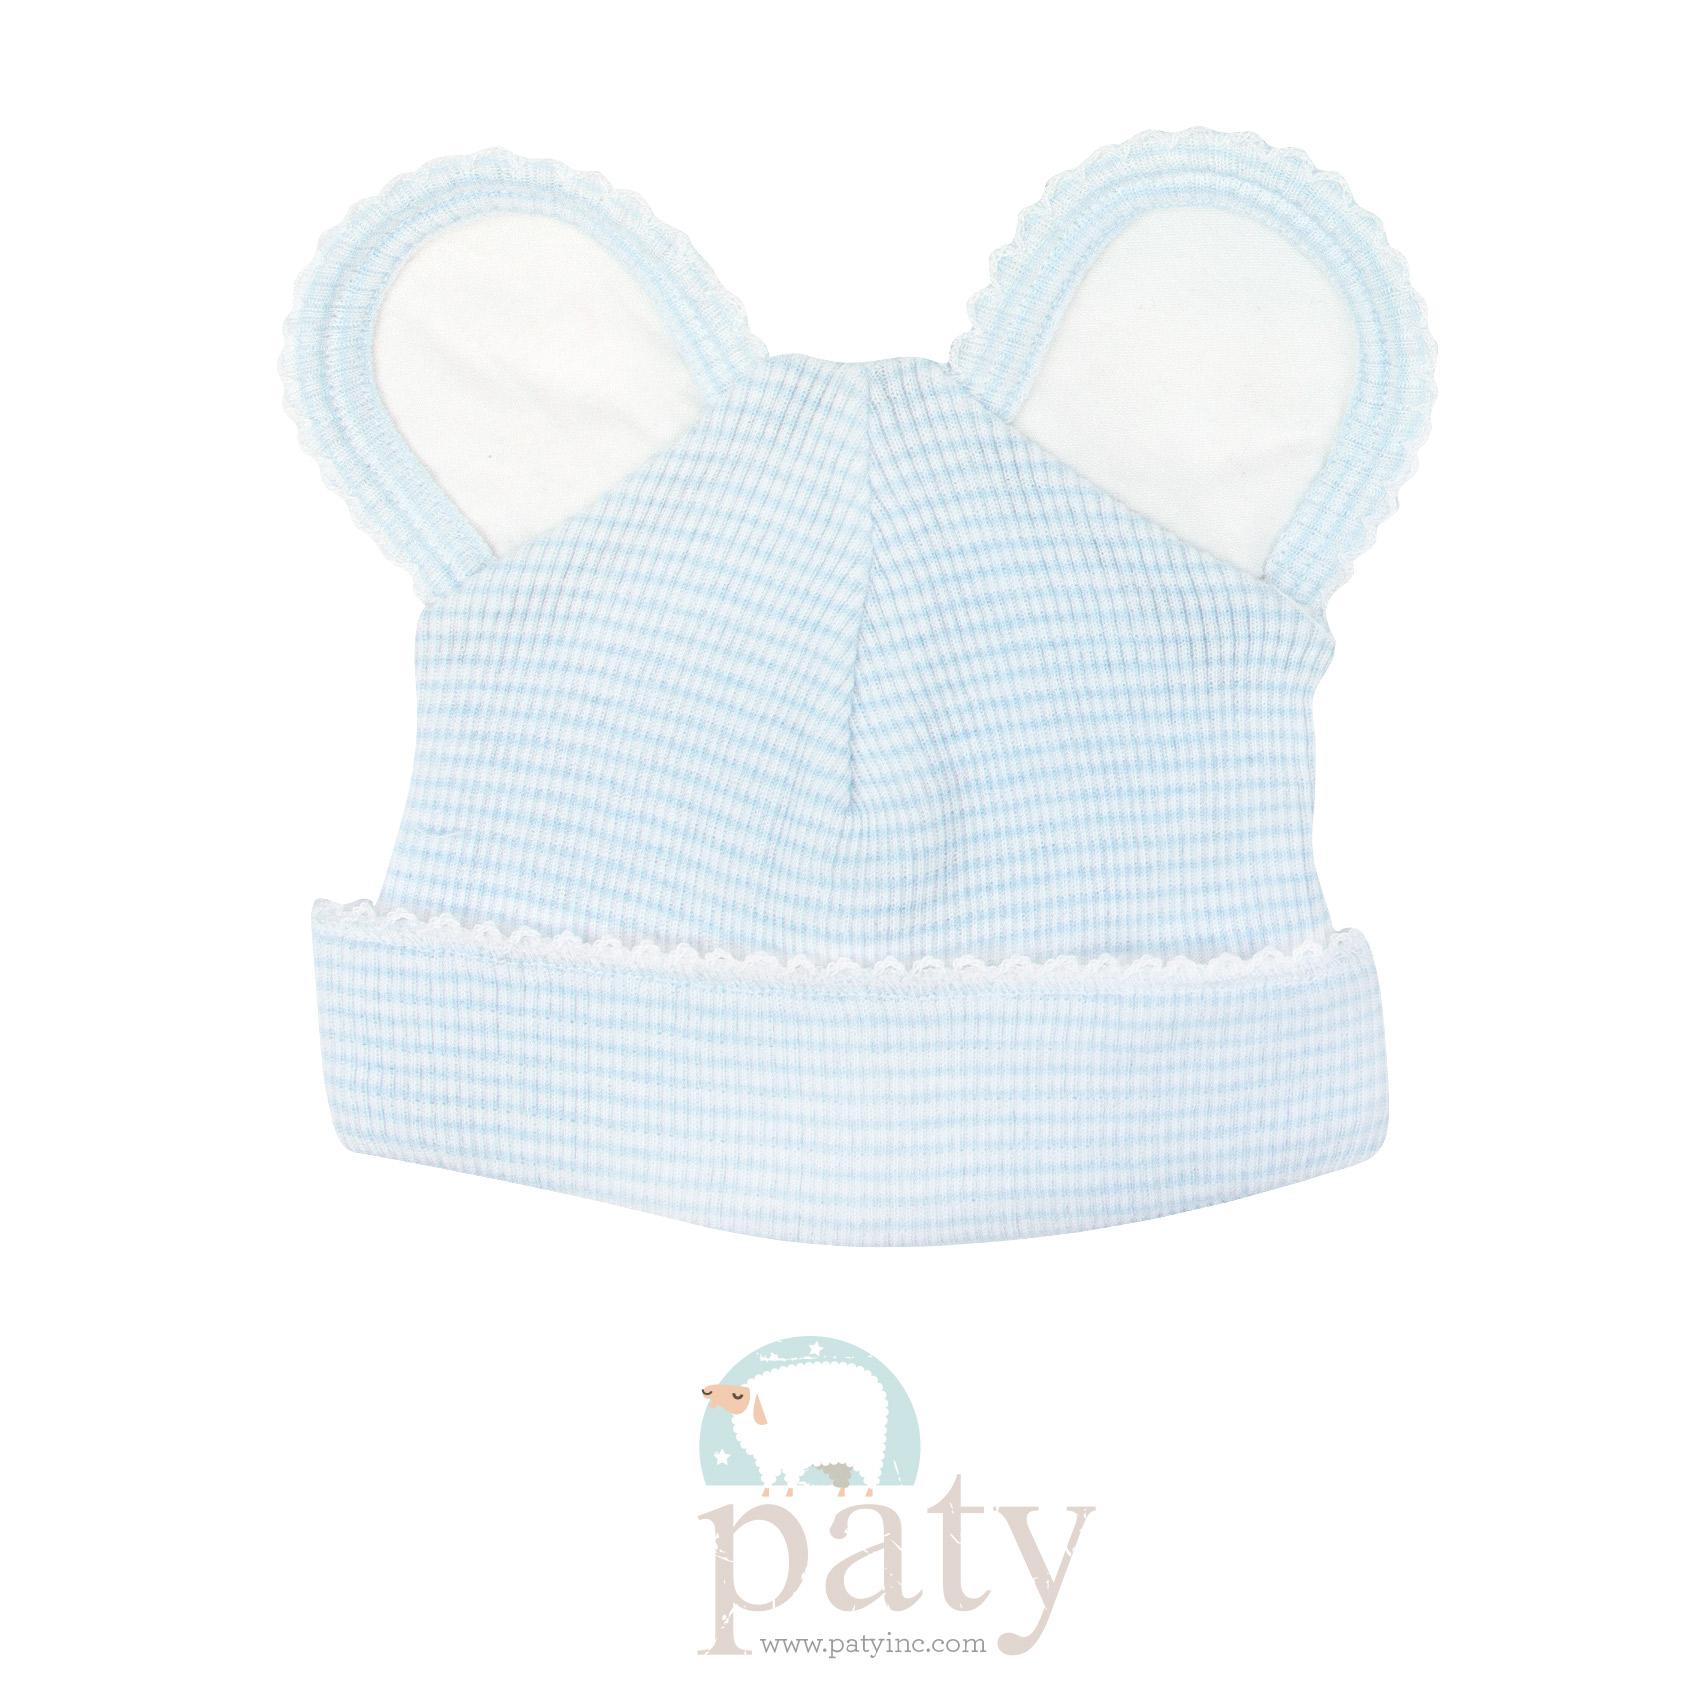 Paty Rib Knit Blue with White Trim Bear Cap